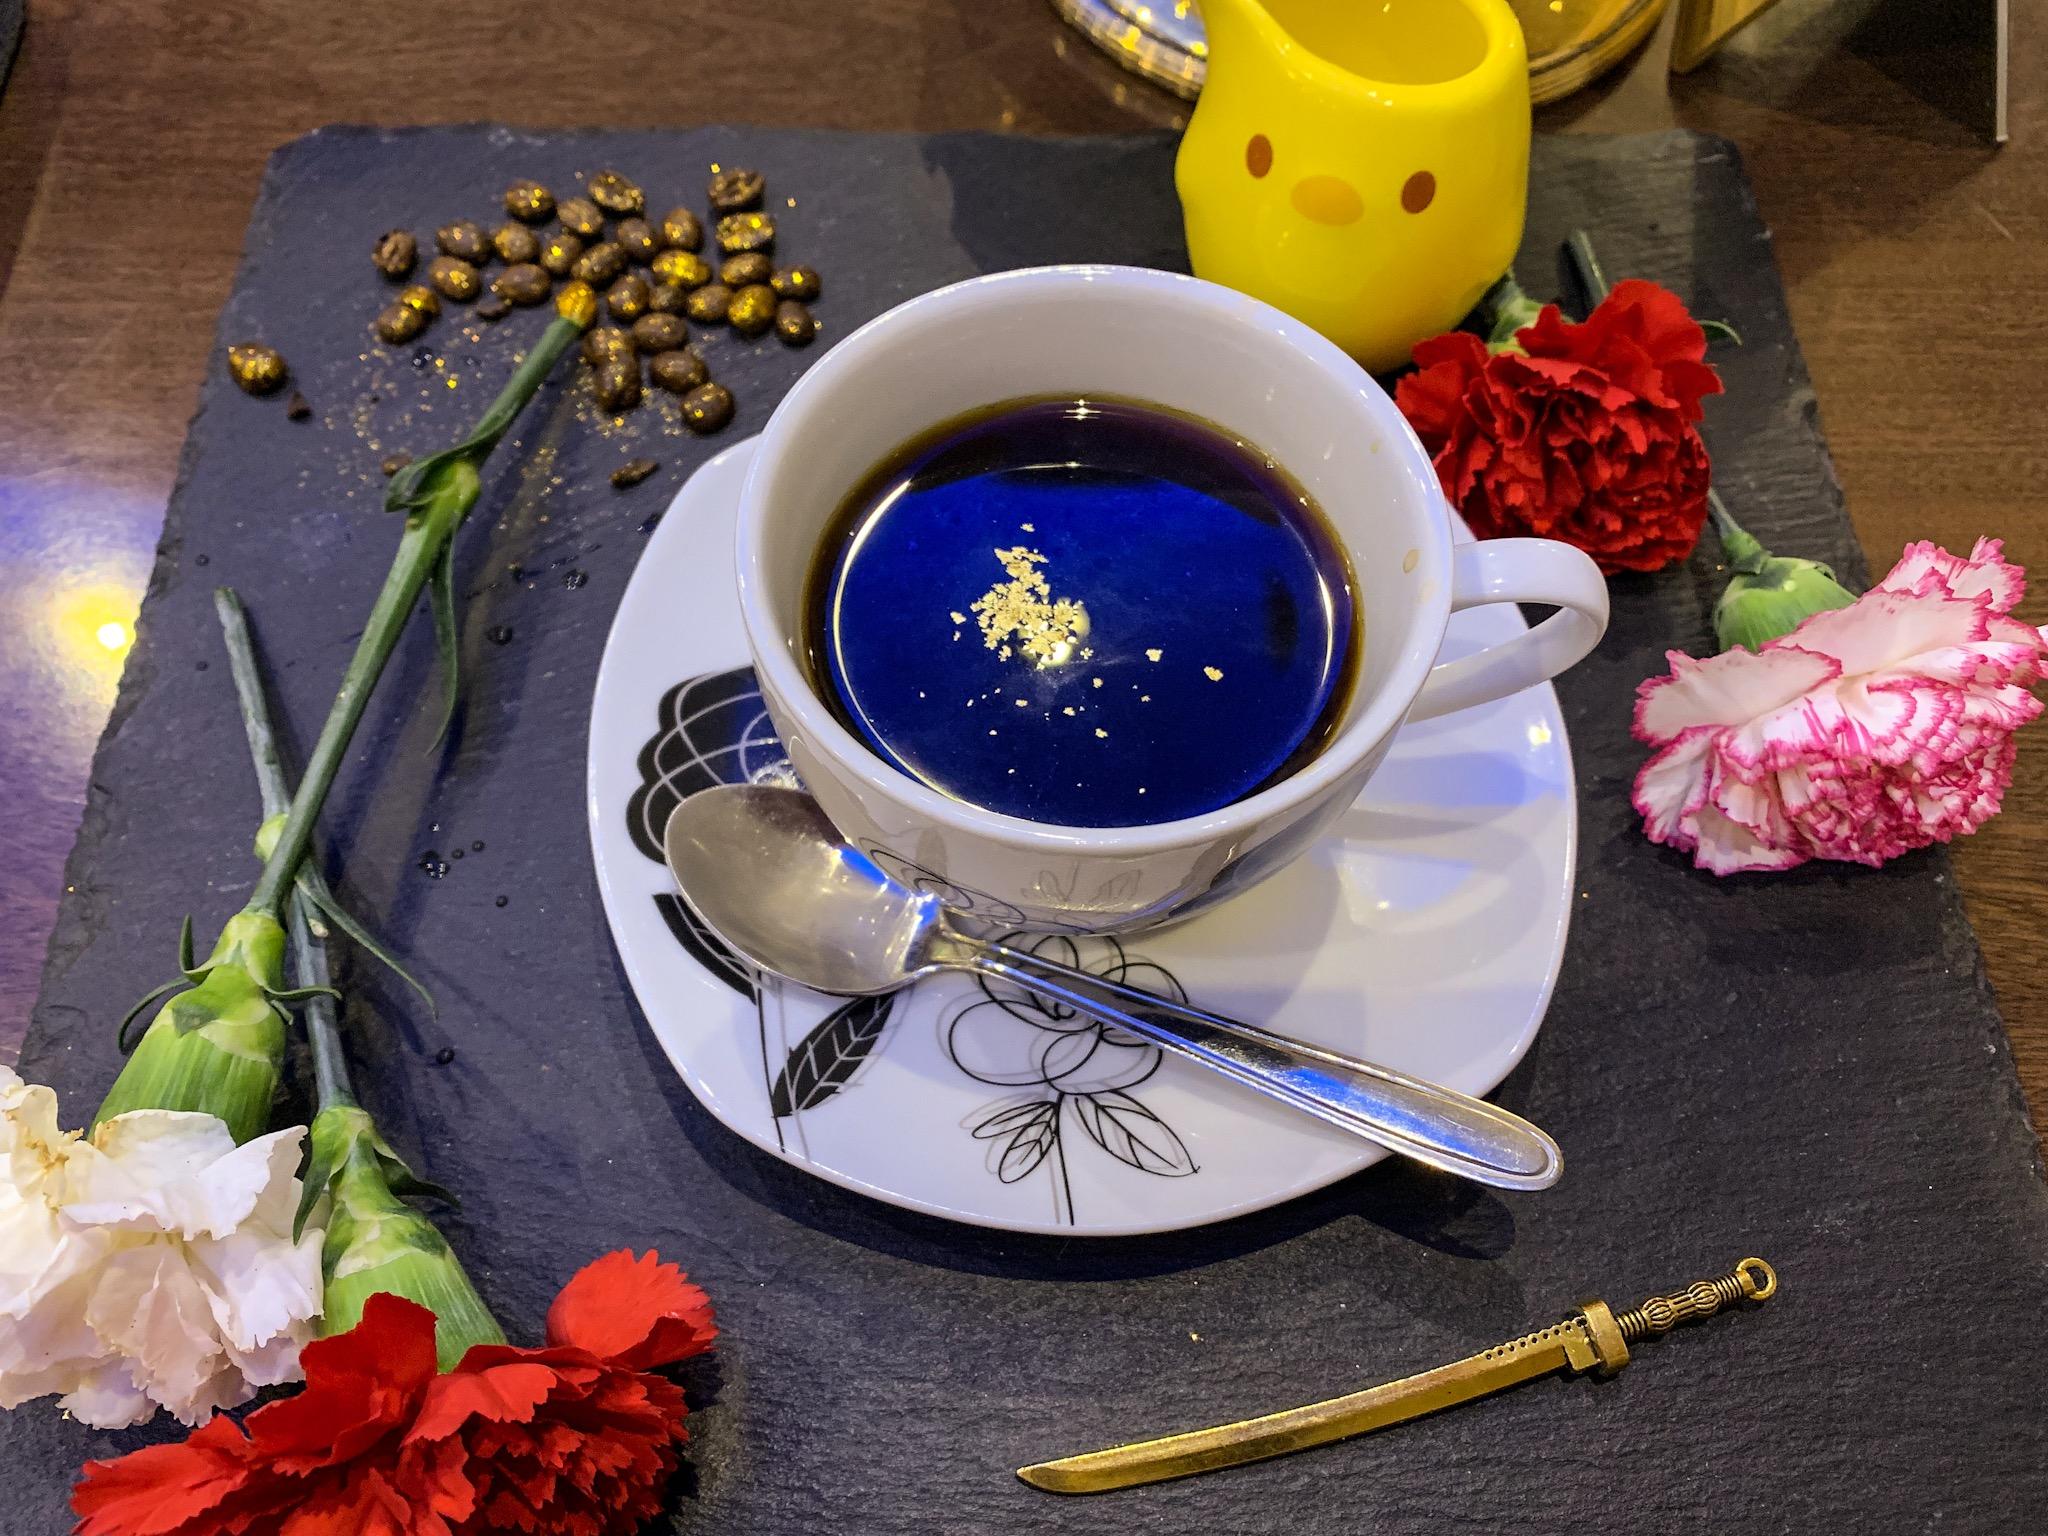 Procafeコーヒー